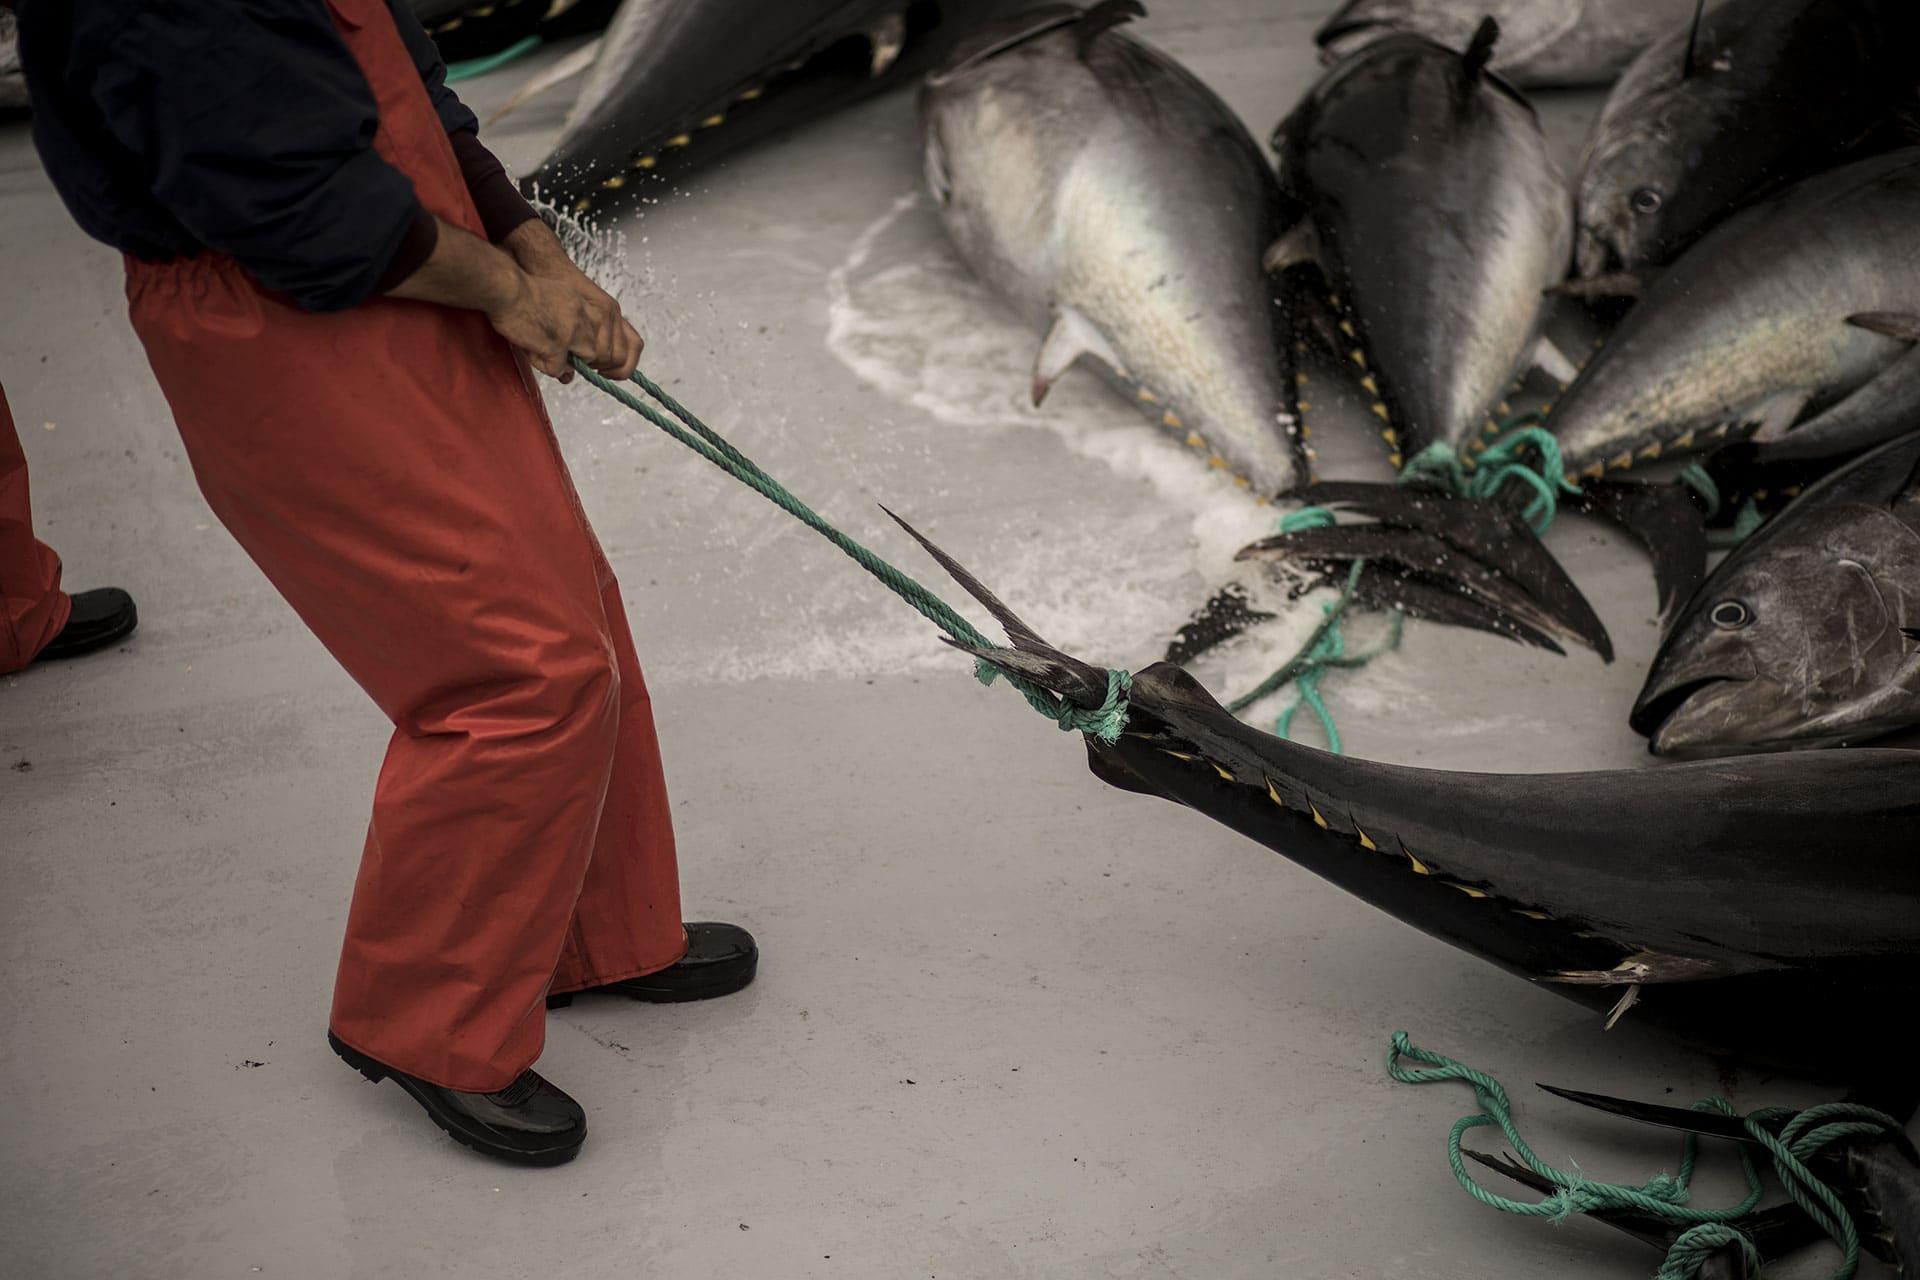 Fisherman moving a tuna